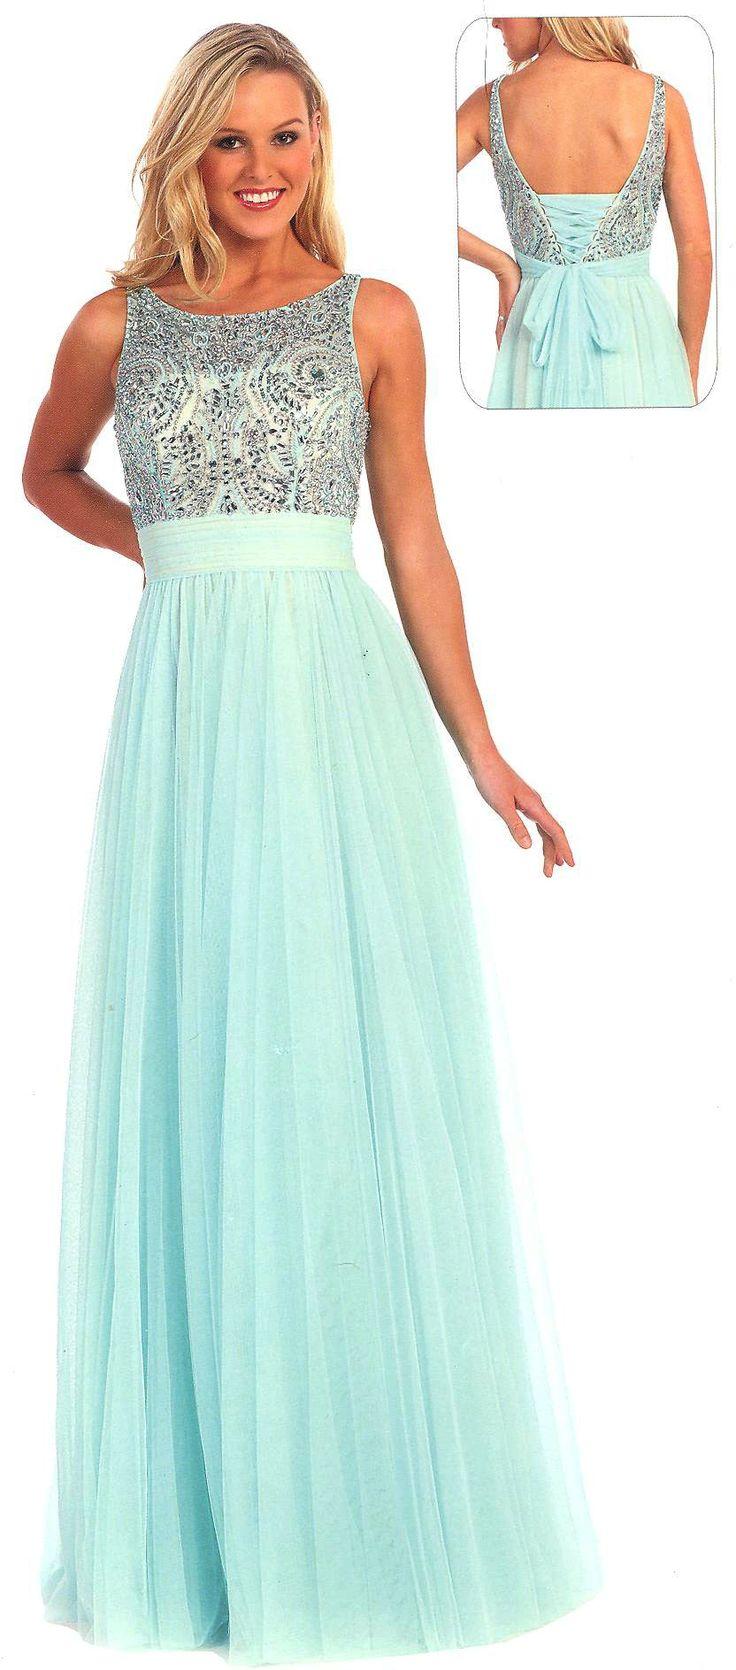 24 best Dress Up! images on Pinterest | Party wear dresses, Formal ...